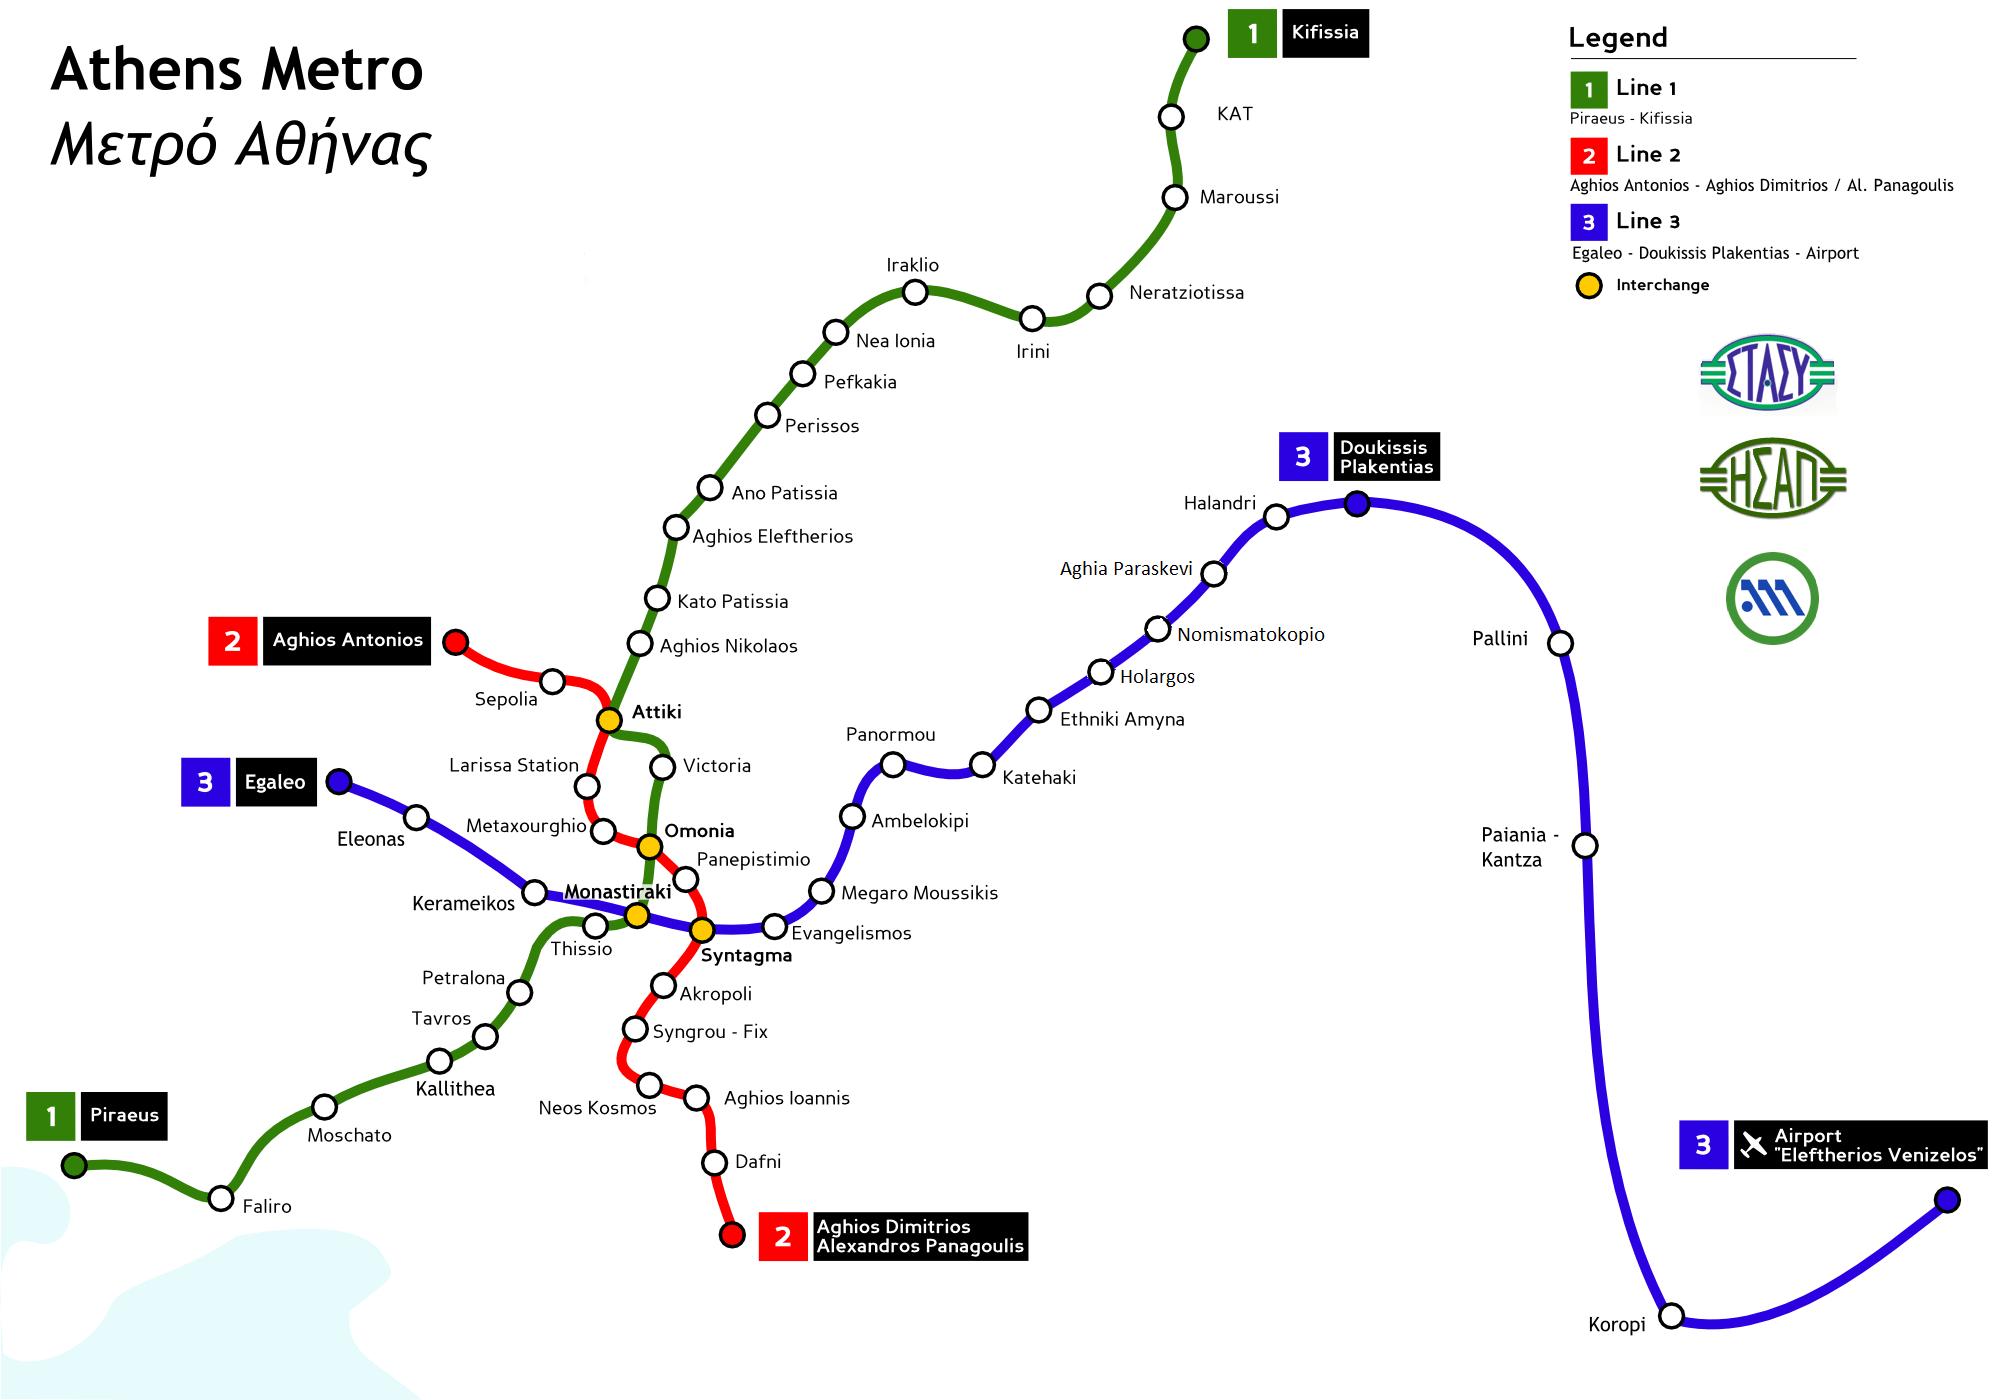 Mapa del metro de Atenas